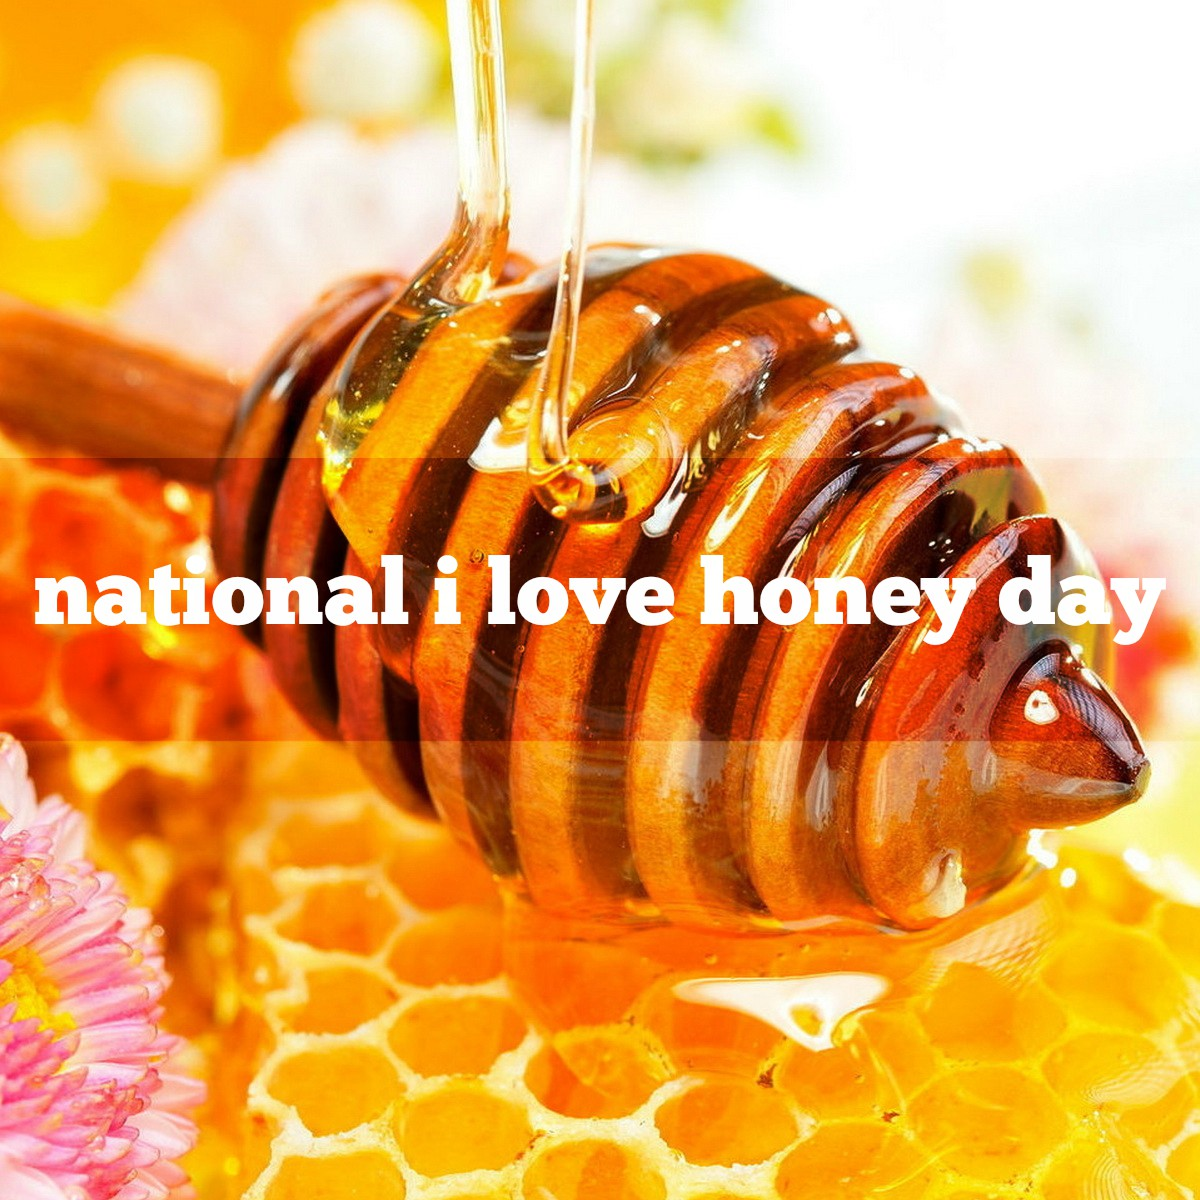 Image result for National I love honey day